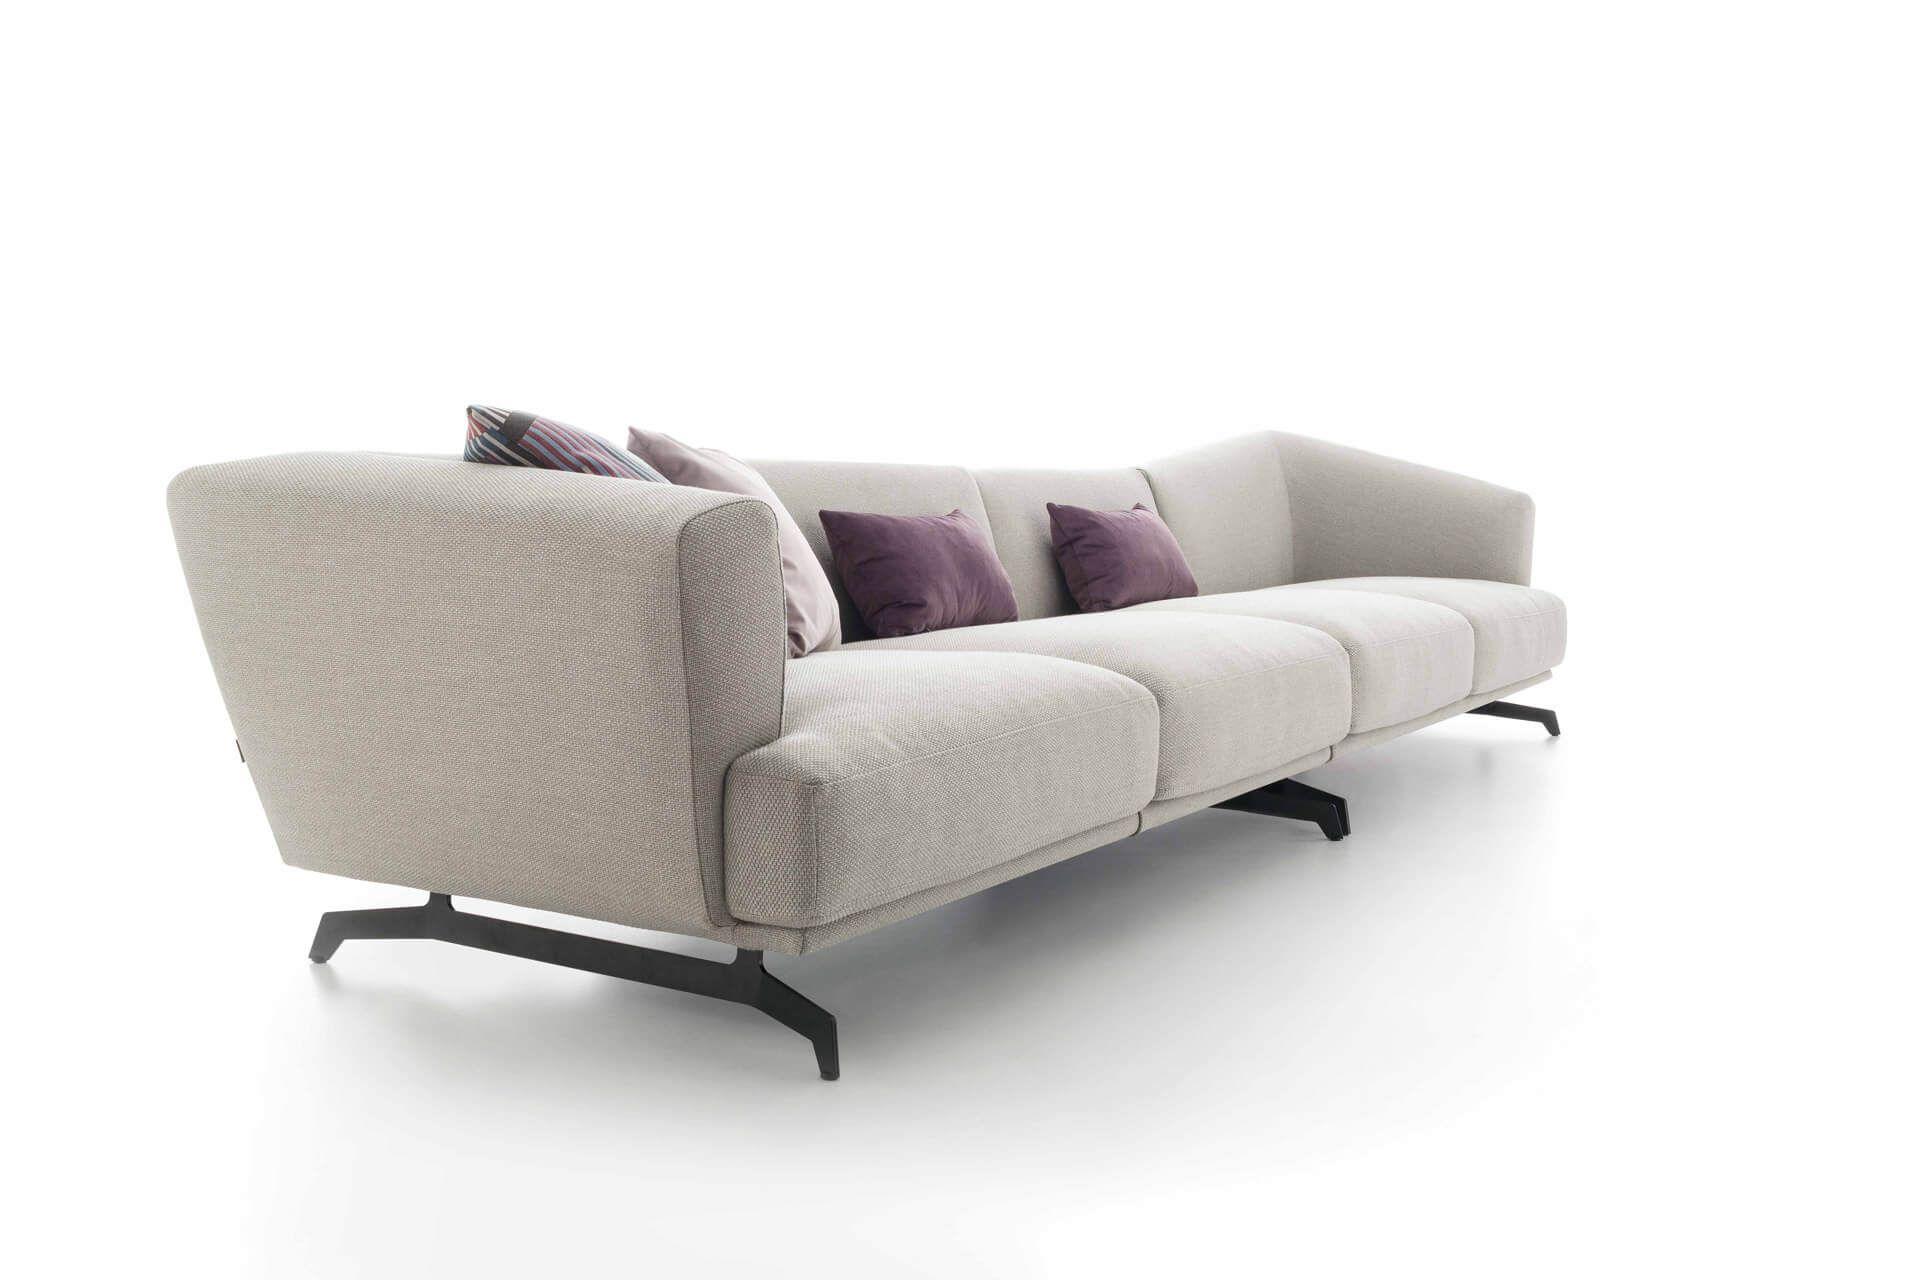 Lennox Ditre Italia Design divano, Divano tessuto